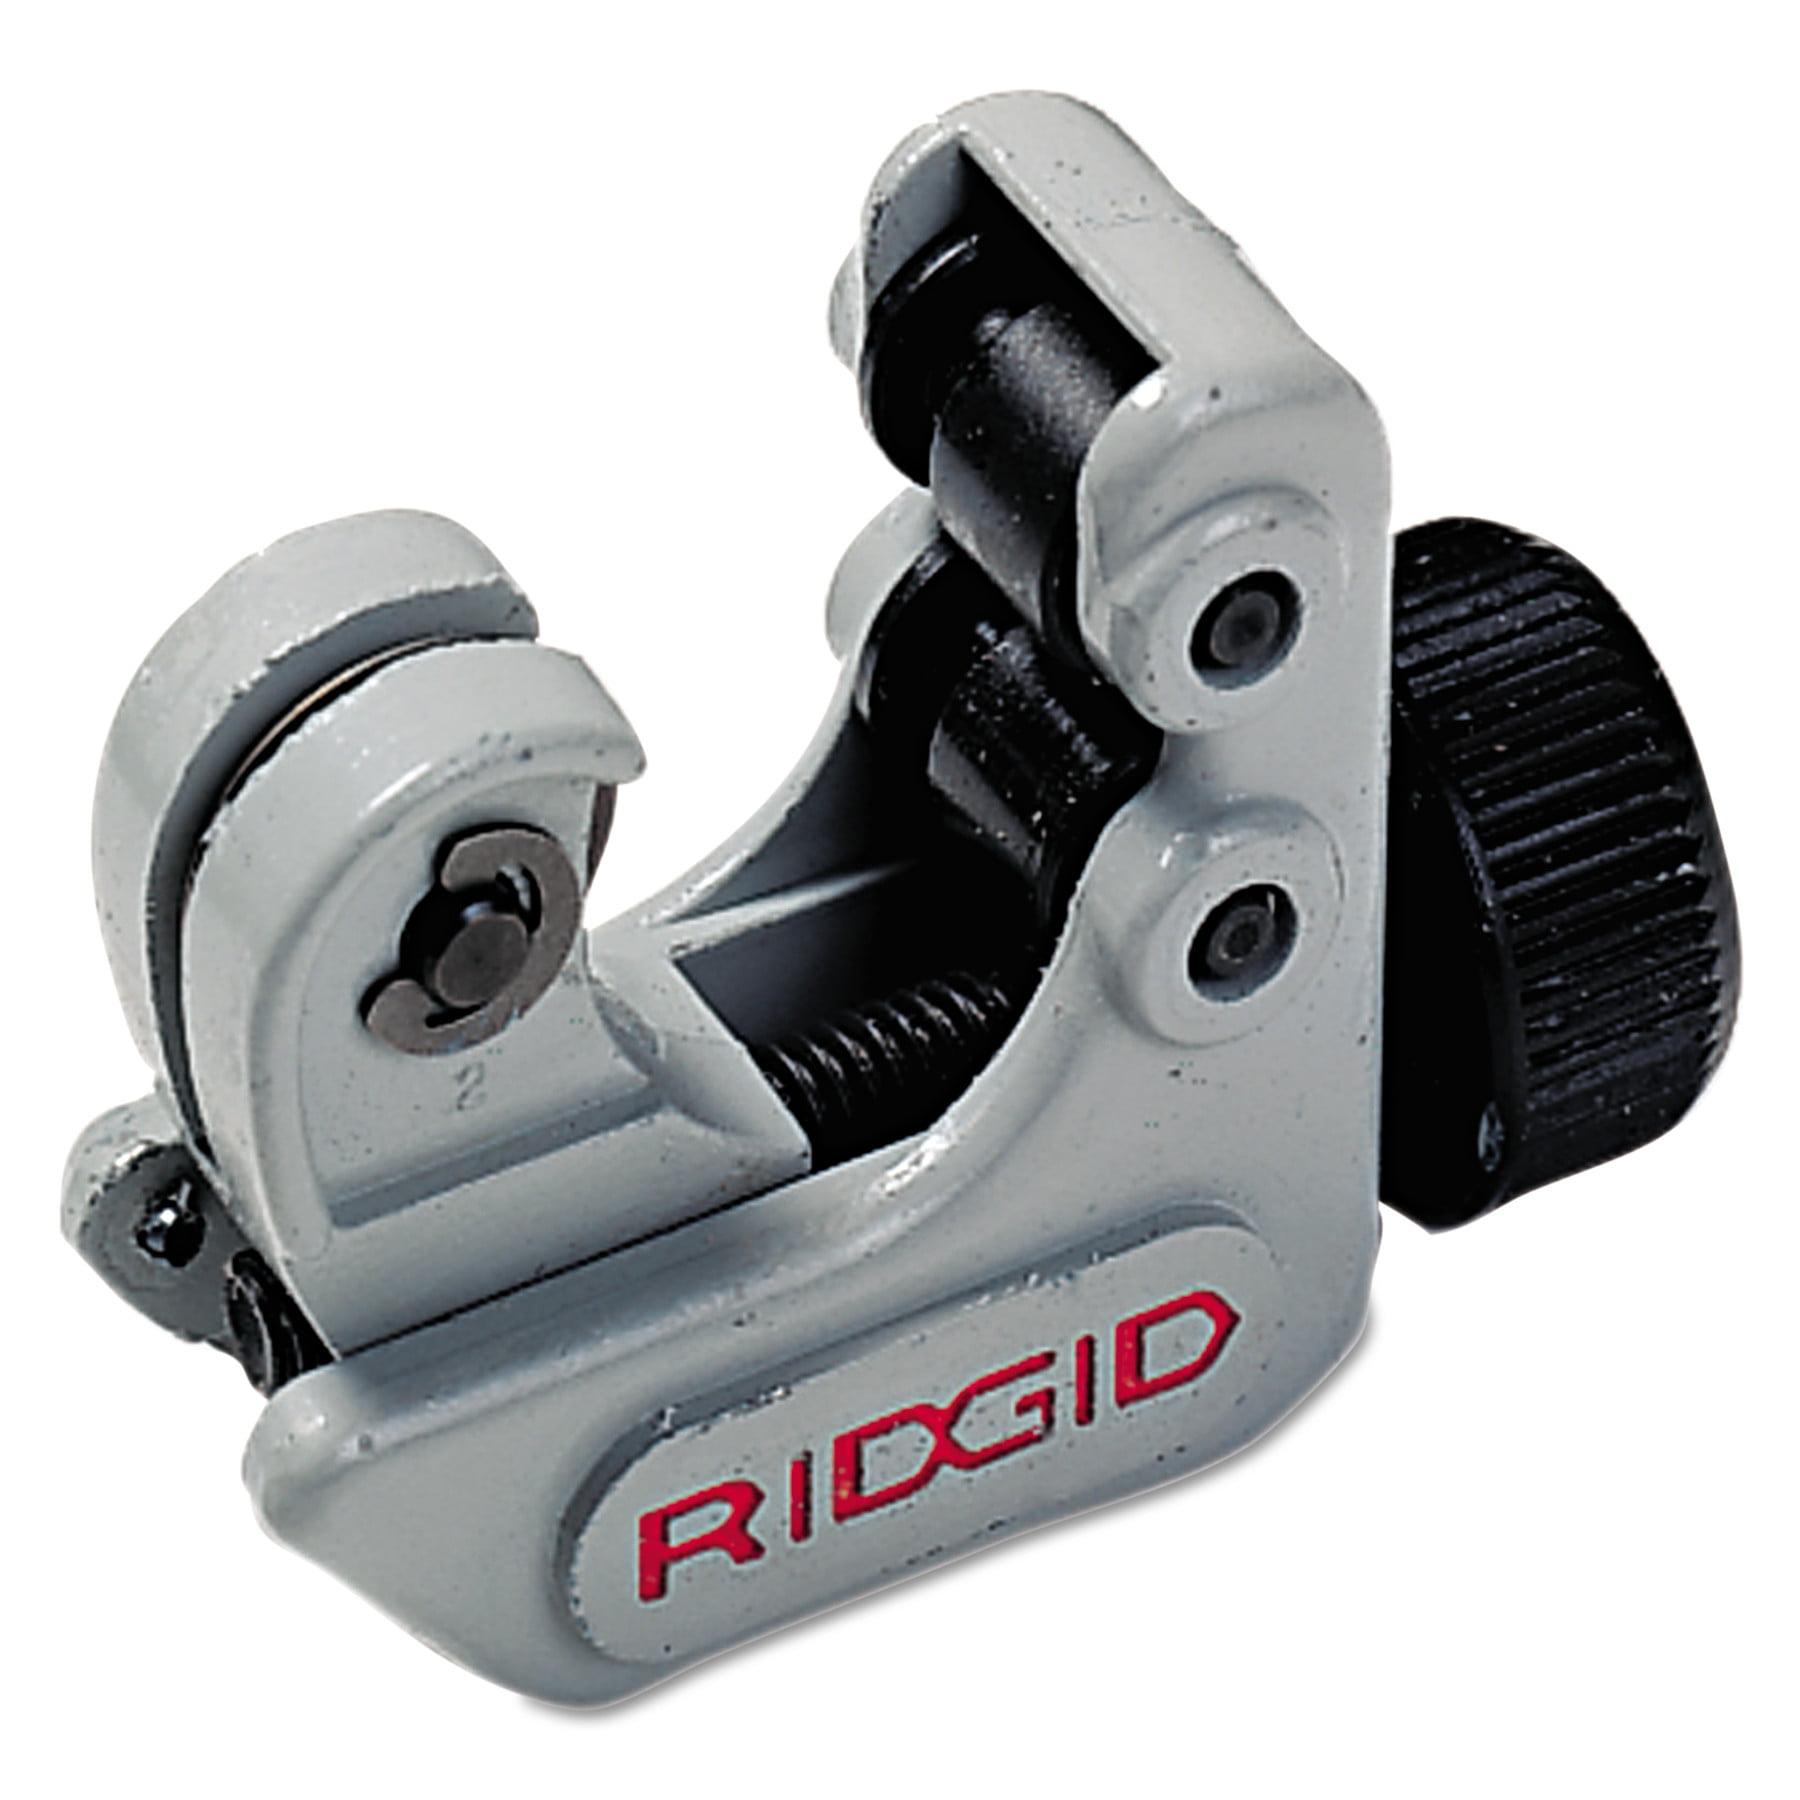 "RIDGID Model 103 Close Quarters Tubing Cutter, 1 1 2"" Tool Length, 1 8 5 8"" Cut... by EMERSON"